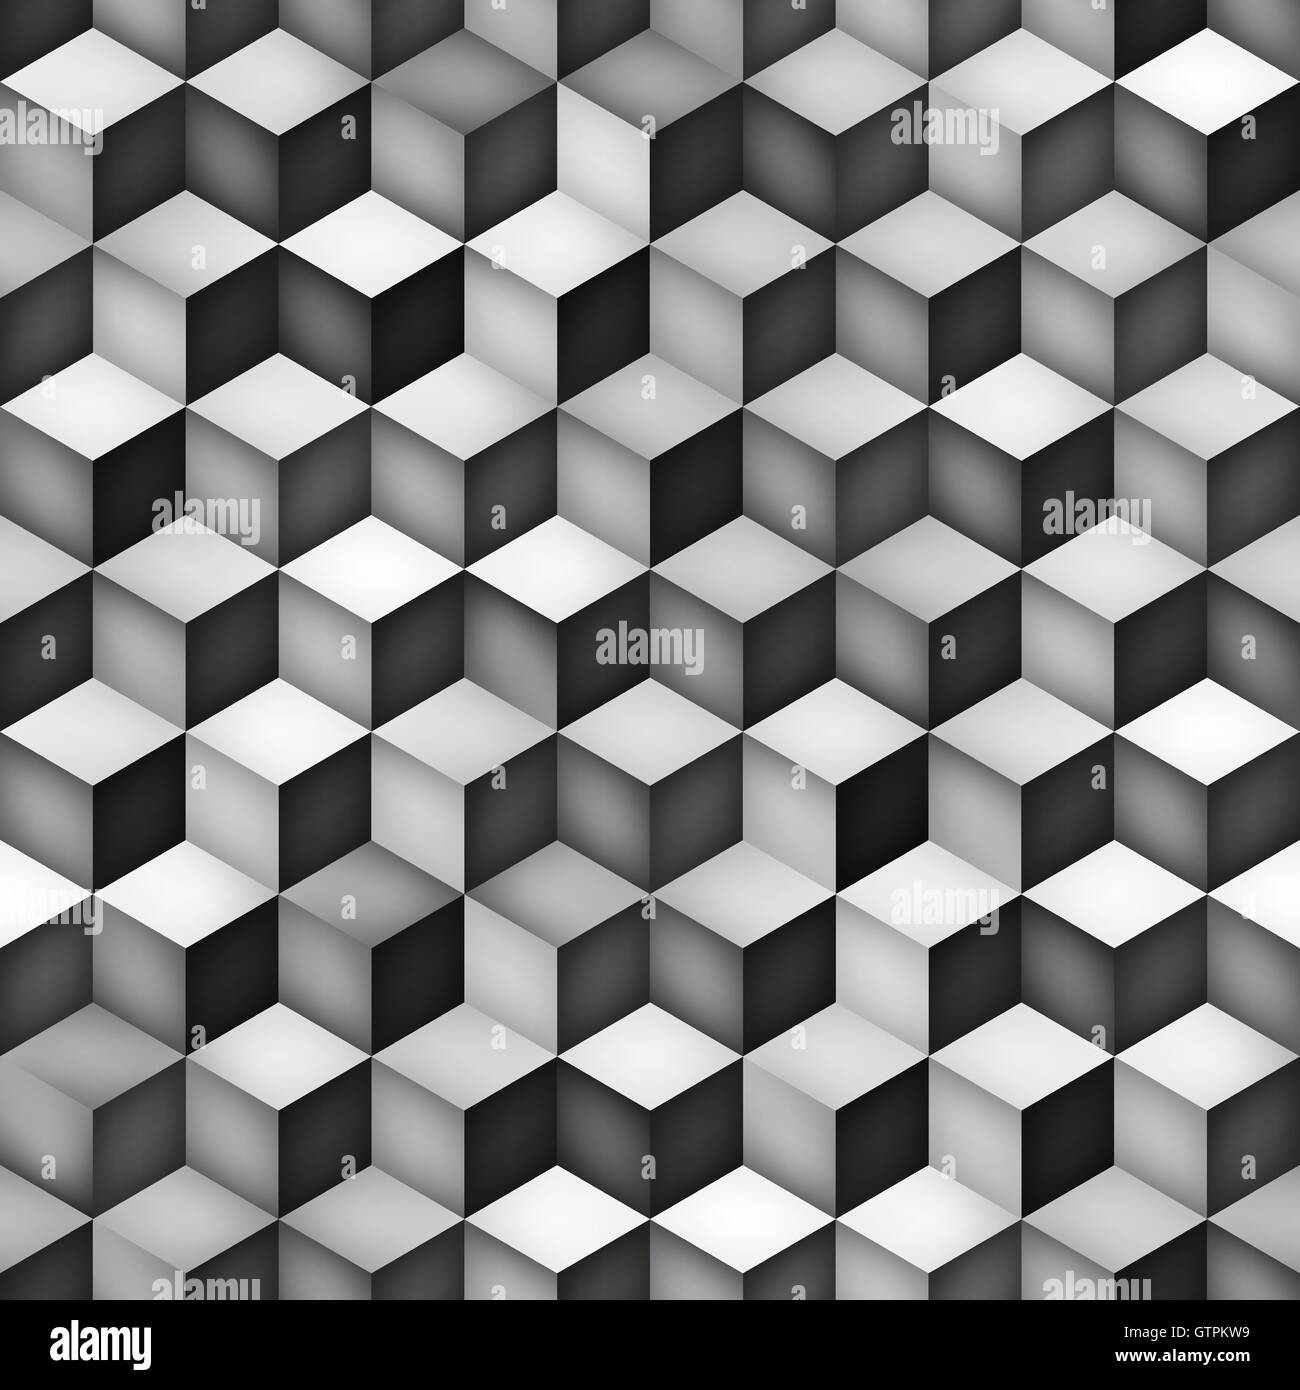 Vector Seamless Greyscale Gra Nt Cube Shape Rhombus Grid Geometric Stock Vector Art